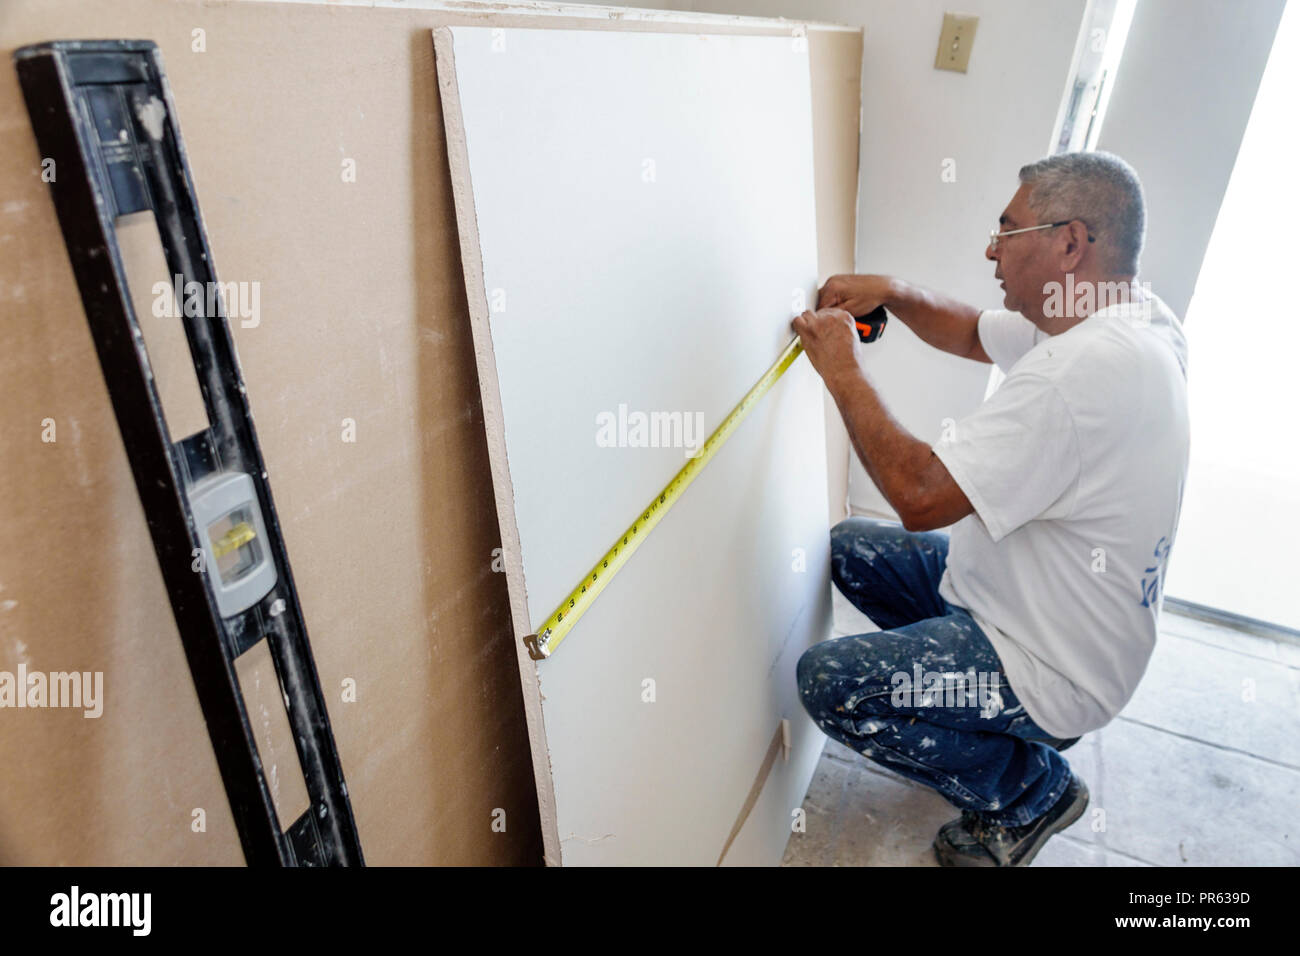 Miami Beach Florida contractor renovation repair drywall Hispanic man measuring tape measure cutting working - Stock Image